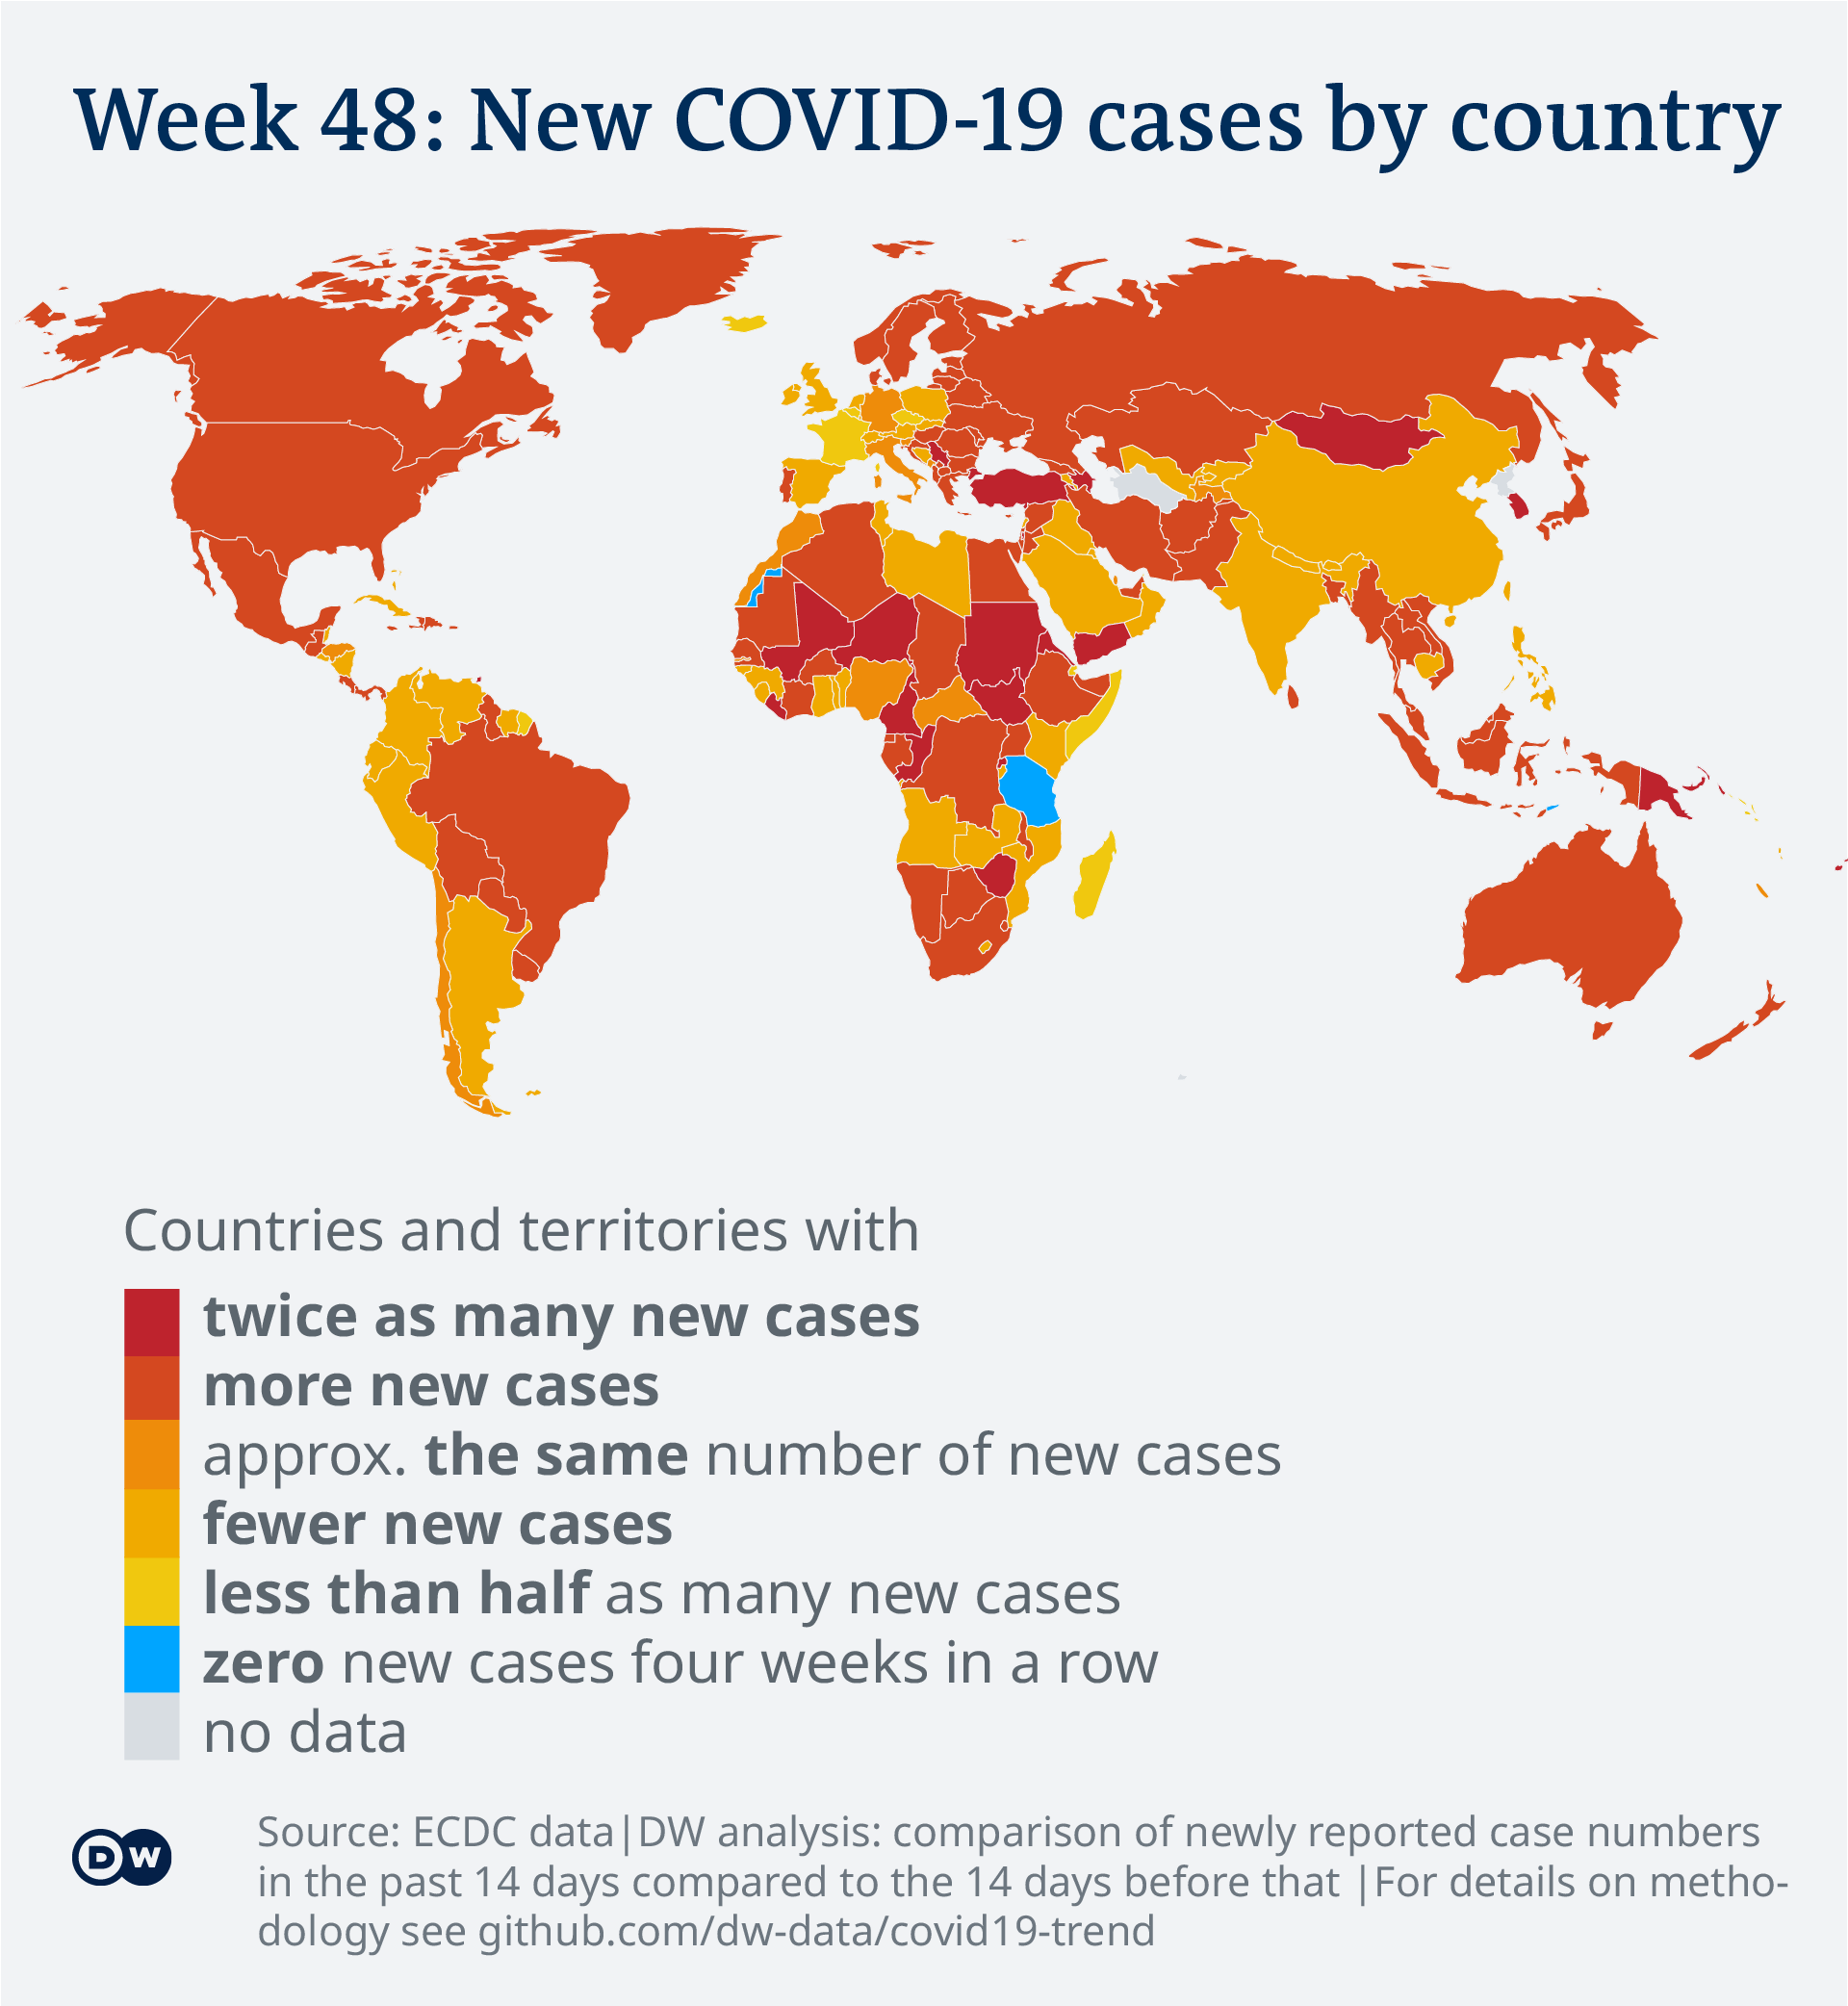 Data visualization: COVID-19 global new case numbers trend - map calendar week 48